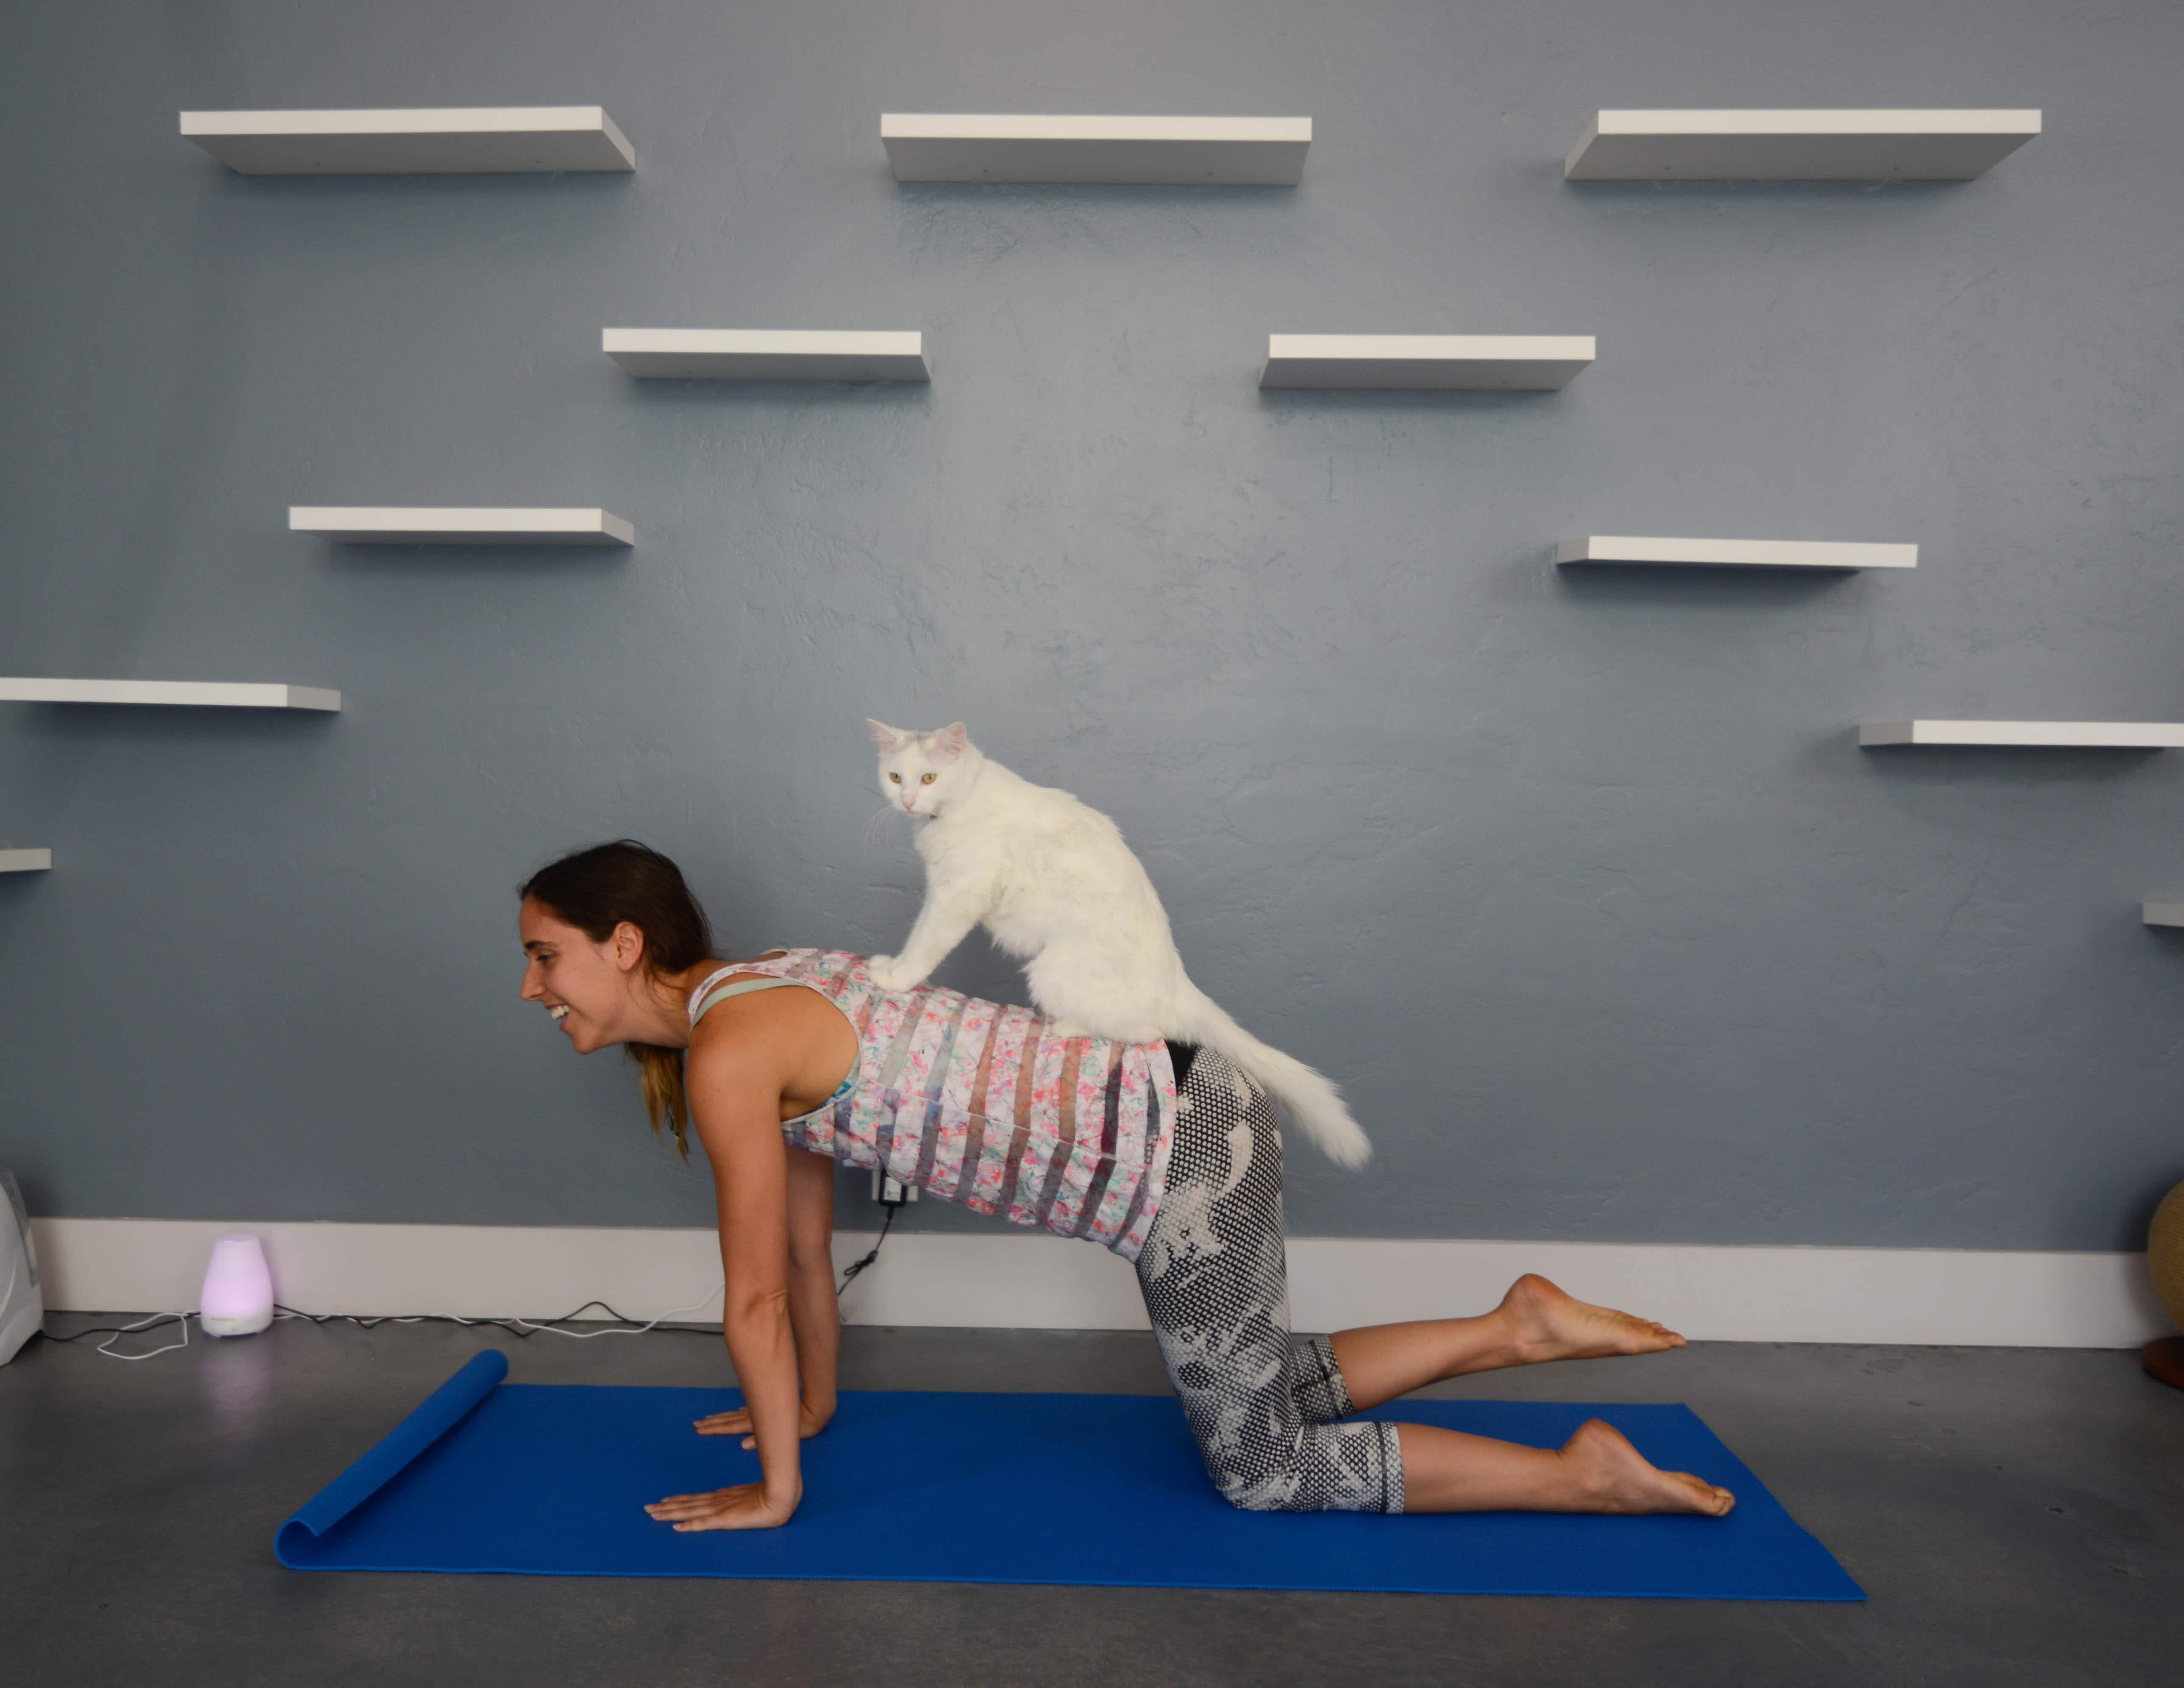 Take yoga with feline friends at Santa Barbara's first ever cat café